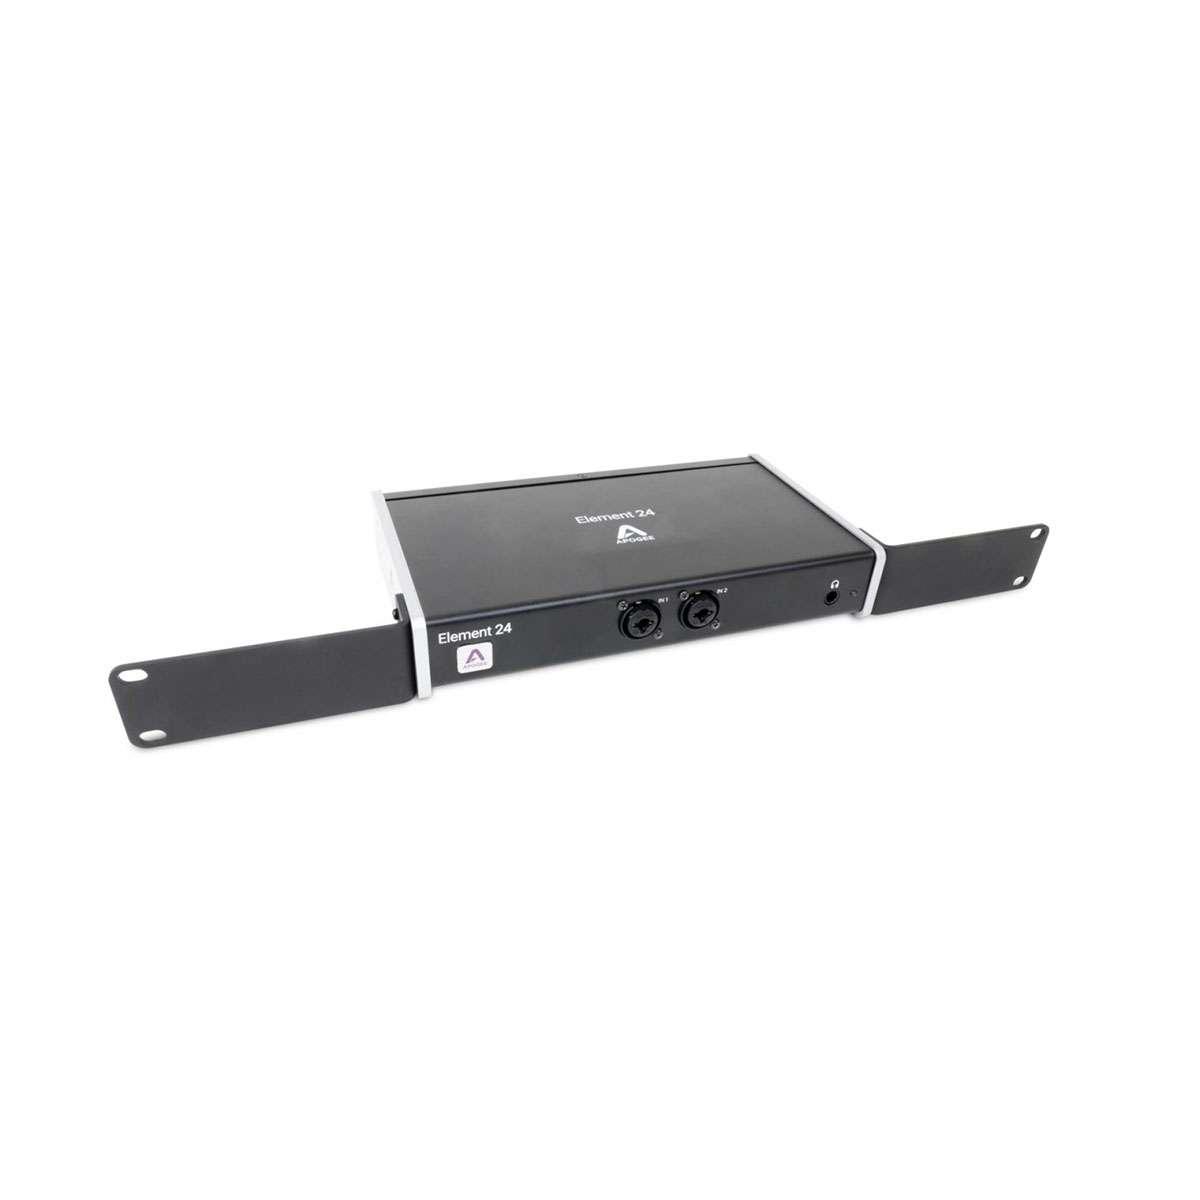 Apogee Rack Ears Element 24 01 Pro Audio, Accessori